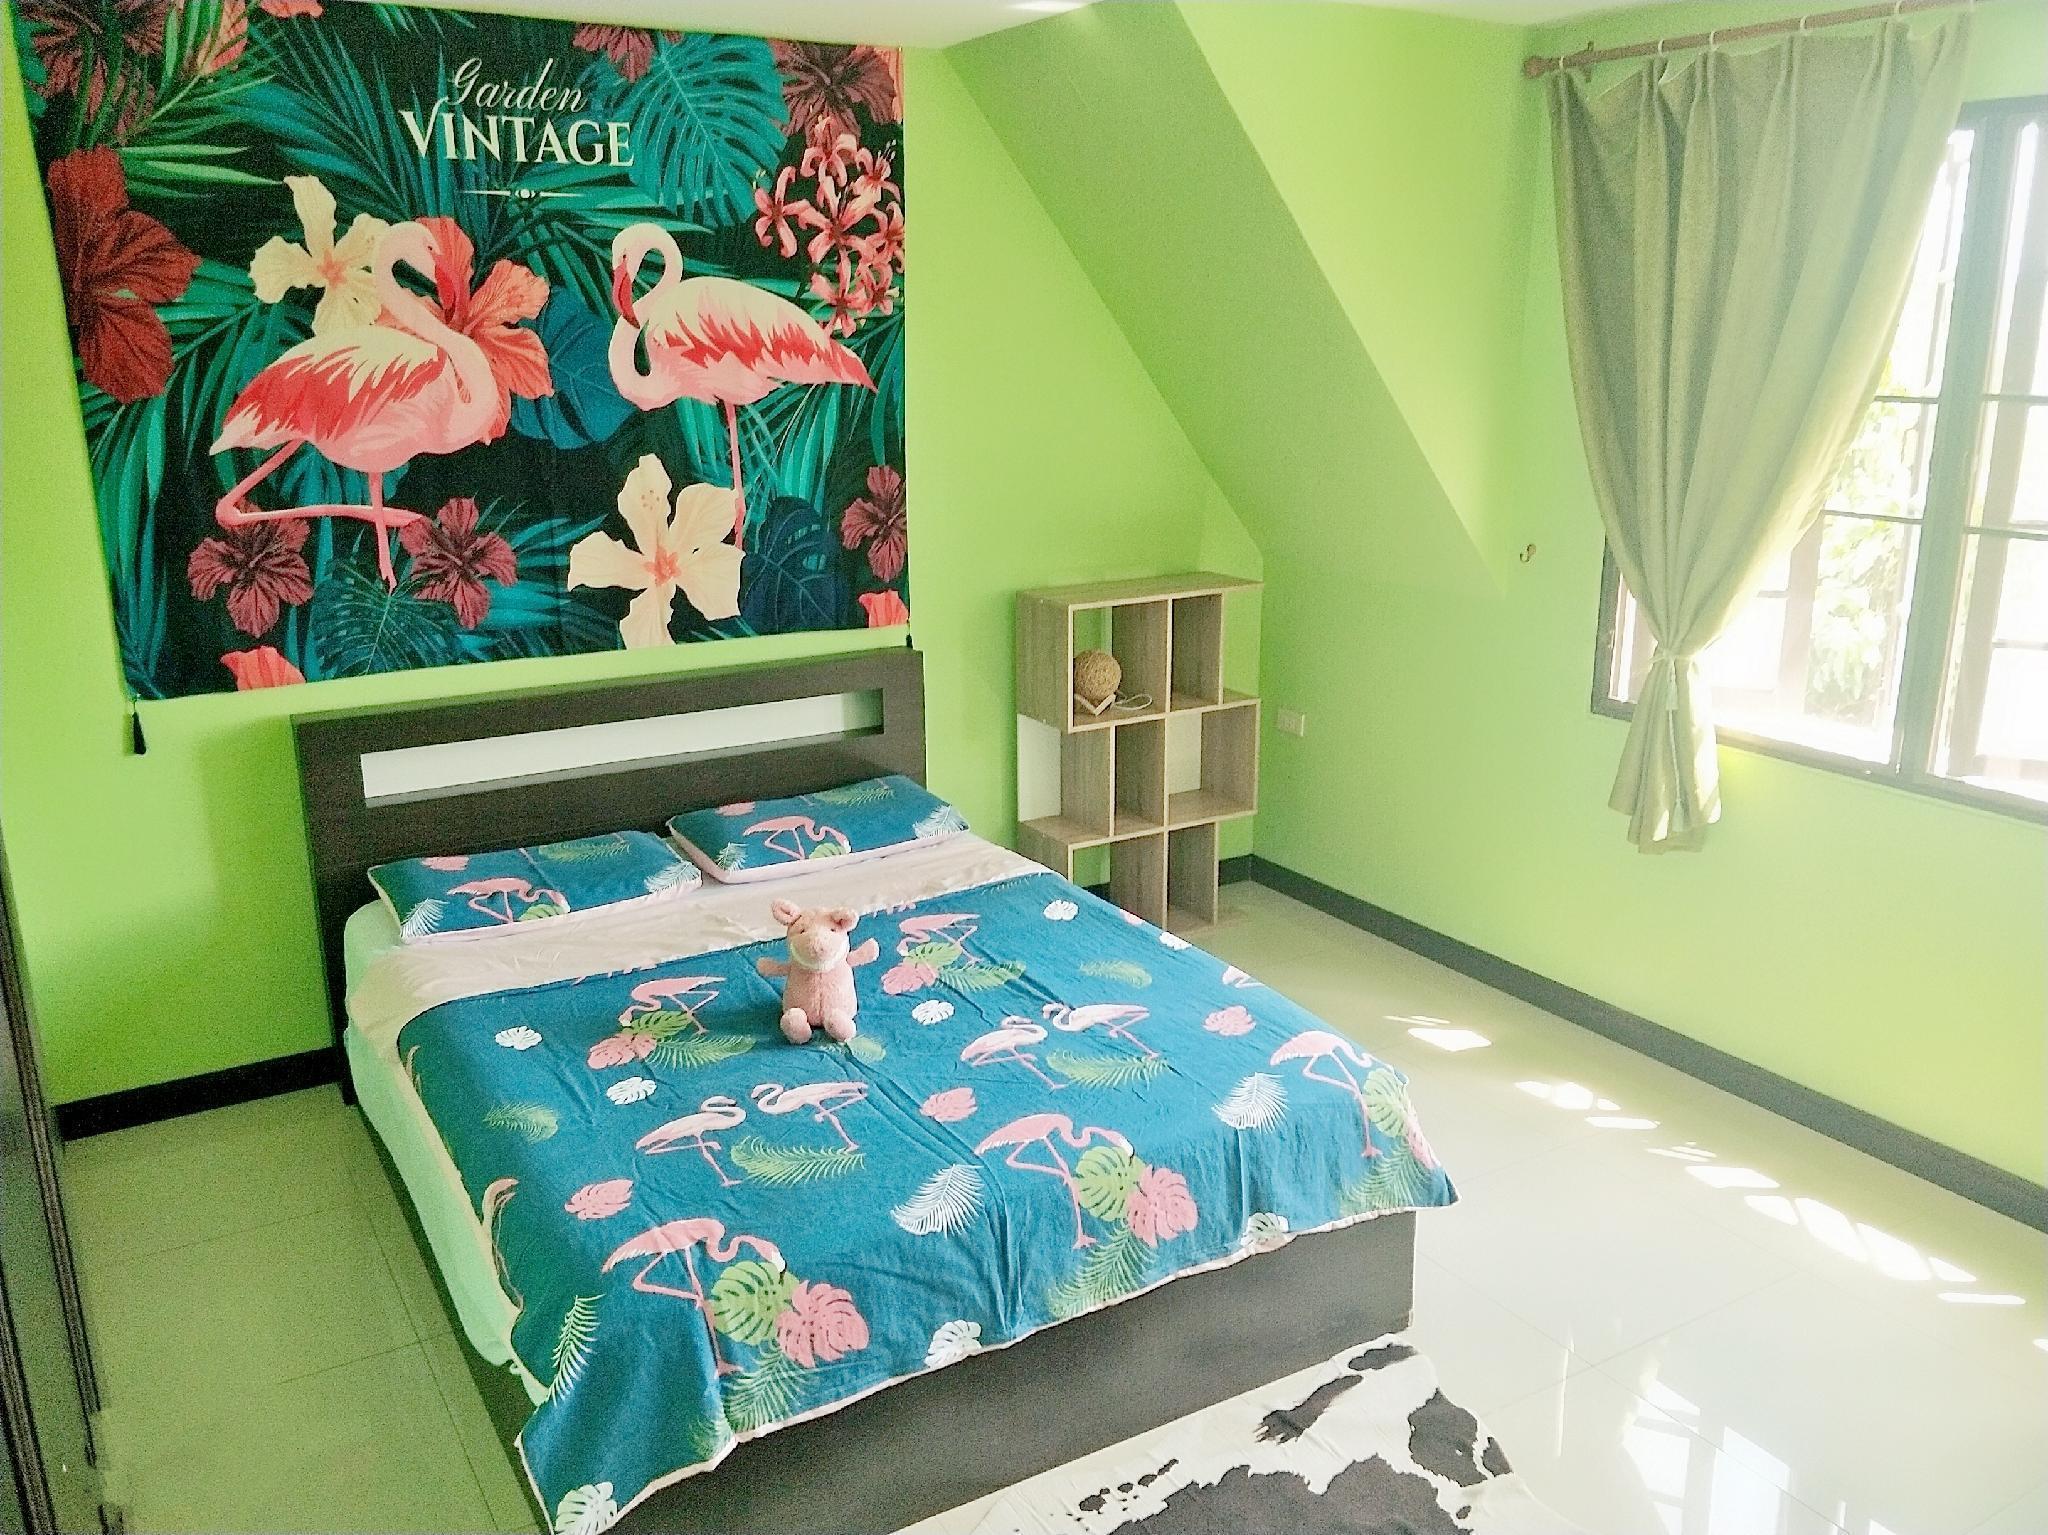 Garden Villa  room 4 Maya/Ningman Road/Independent วิลลา 1 ห้องนอน 1 ห้องน้ำส่วนตัว ขนาด 20 ตร.ม. – ห้วยแก้ว